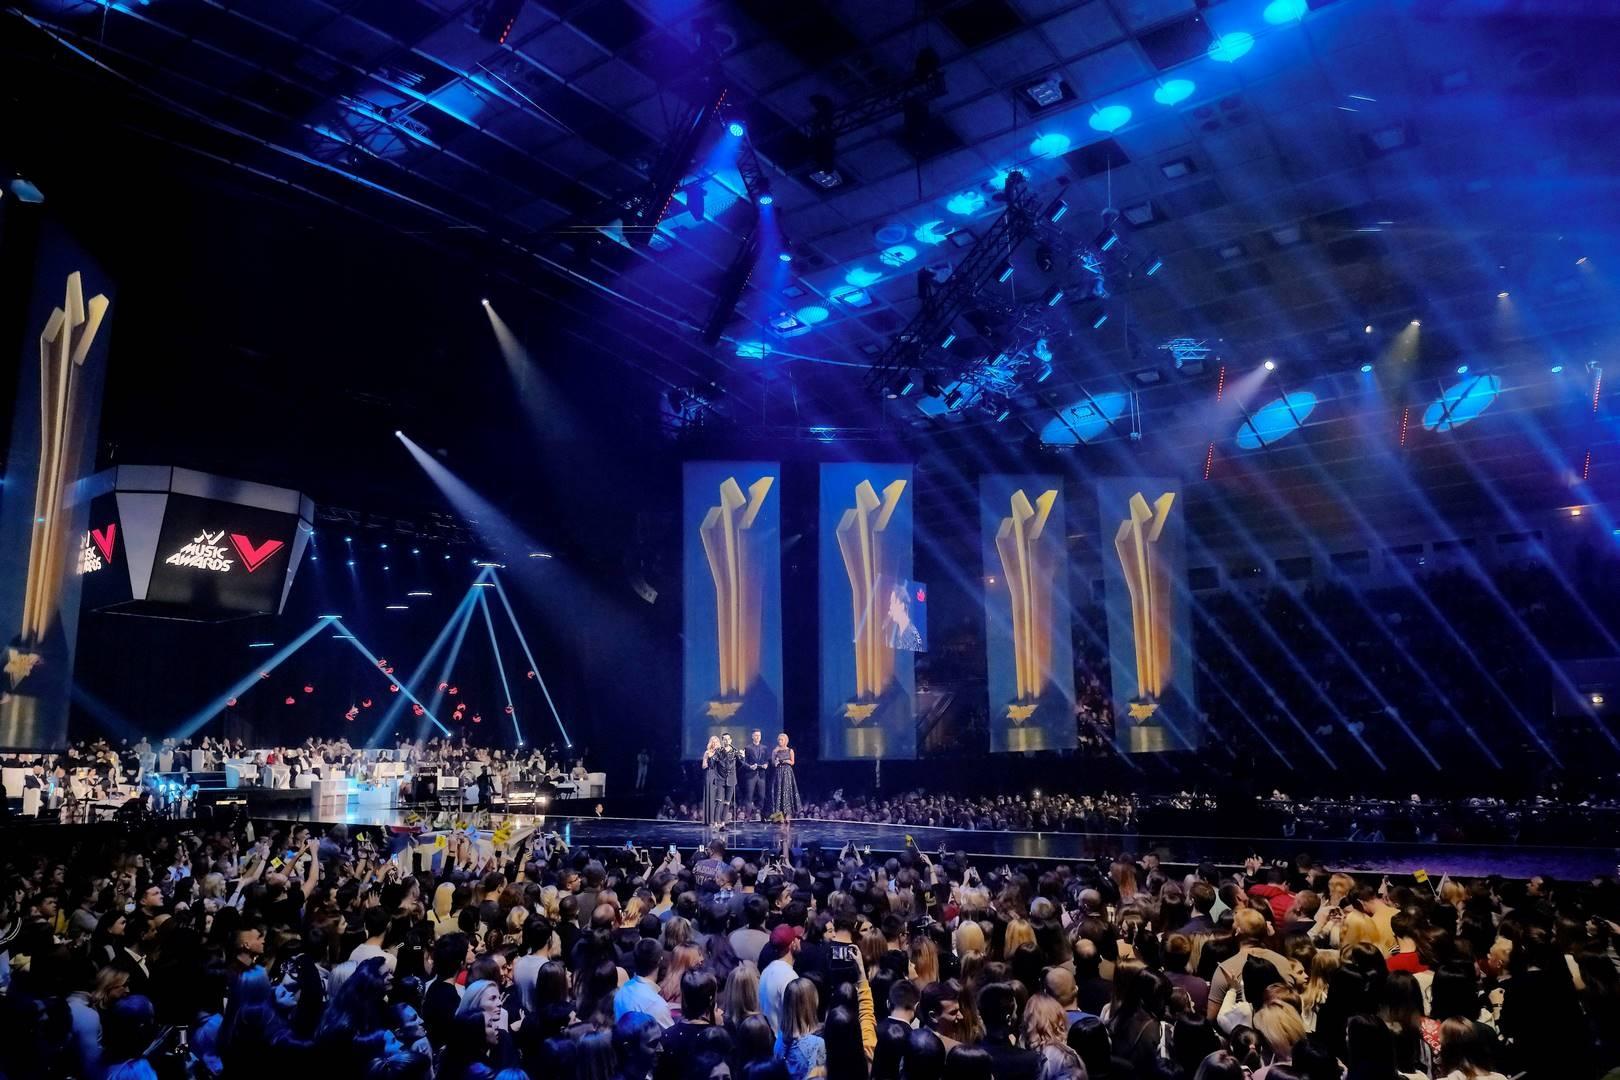 "Грандиозноешоу ""M1 Music Awards""переносят на следующий год из-за пандемии - фото №2"